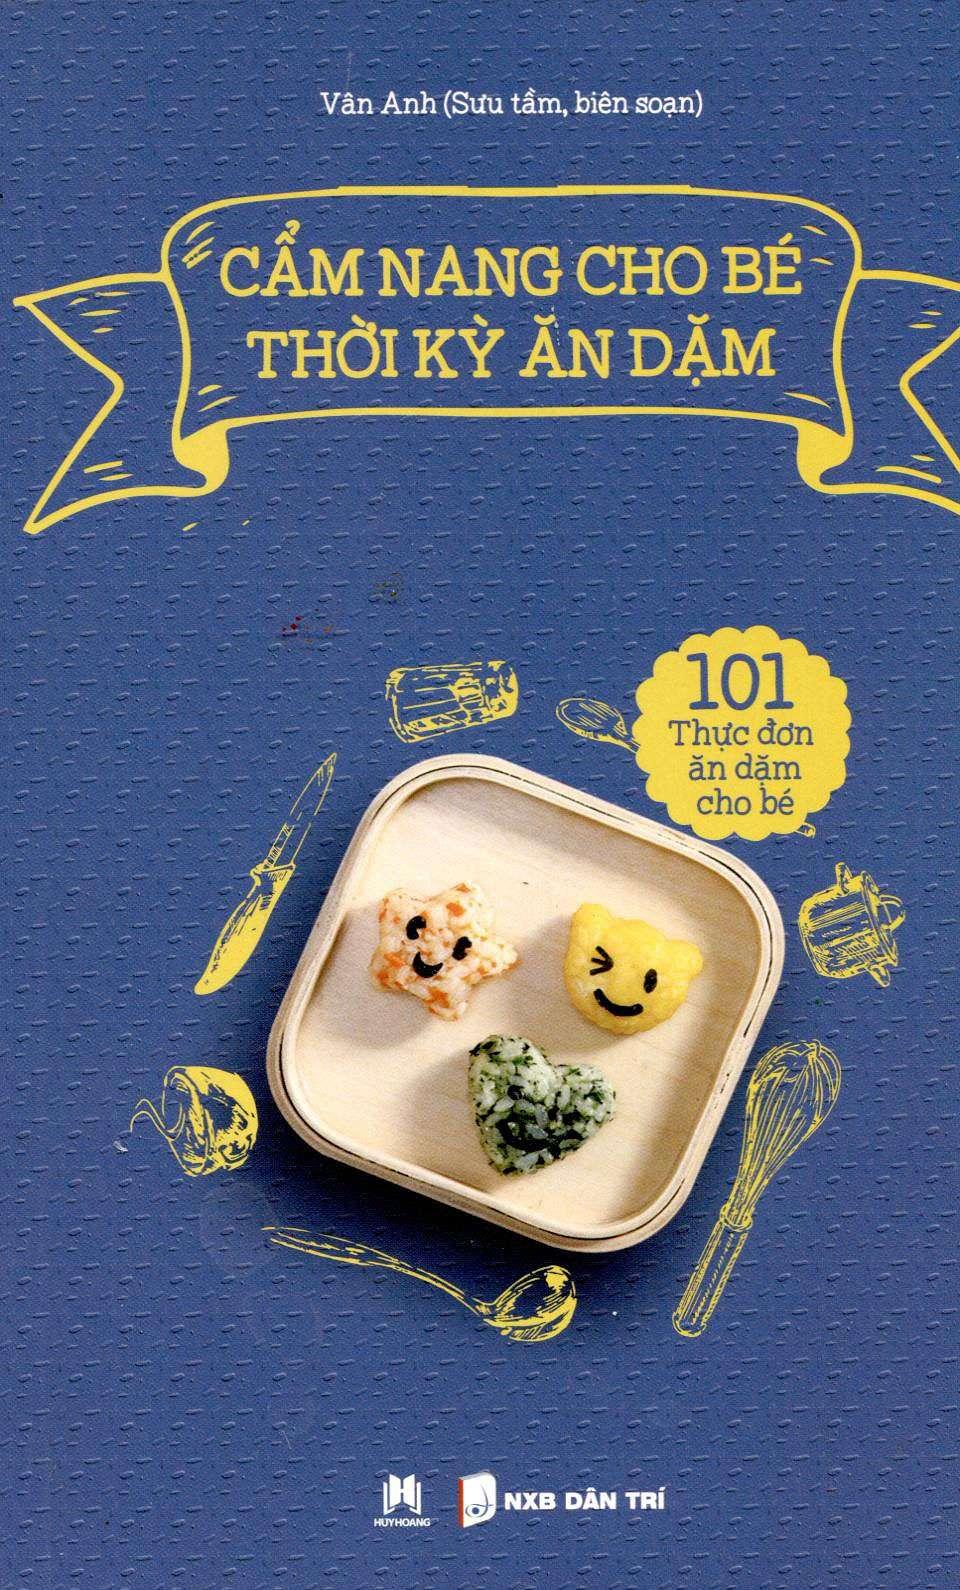 sach-day-an-dam-cam-nang-cho-be-thoi-ky-an-dam